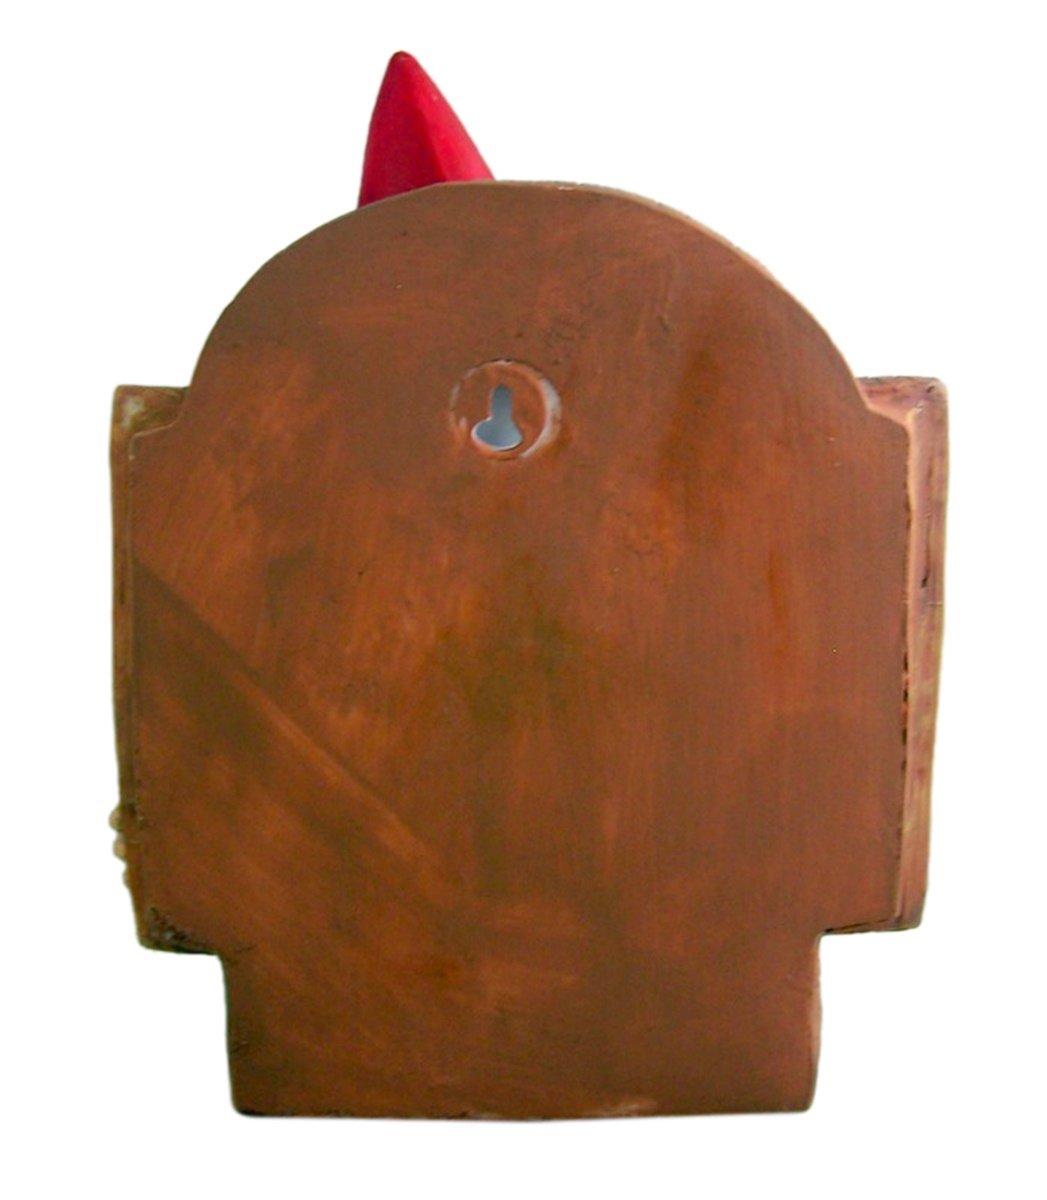 Grumpy Gnome Go Away Wall Plaque 8.75 Inch